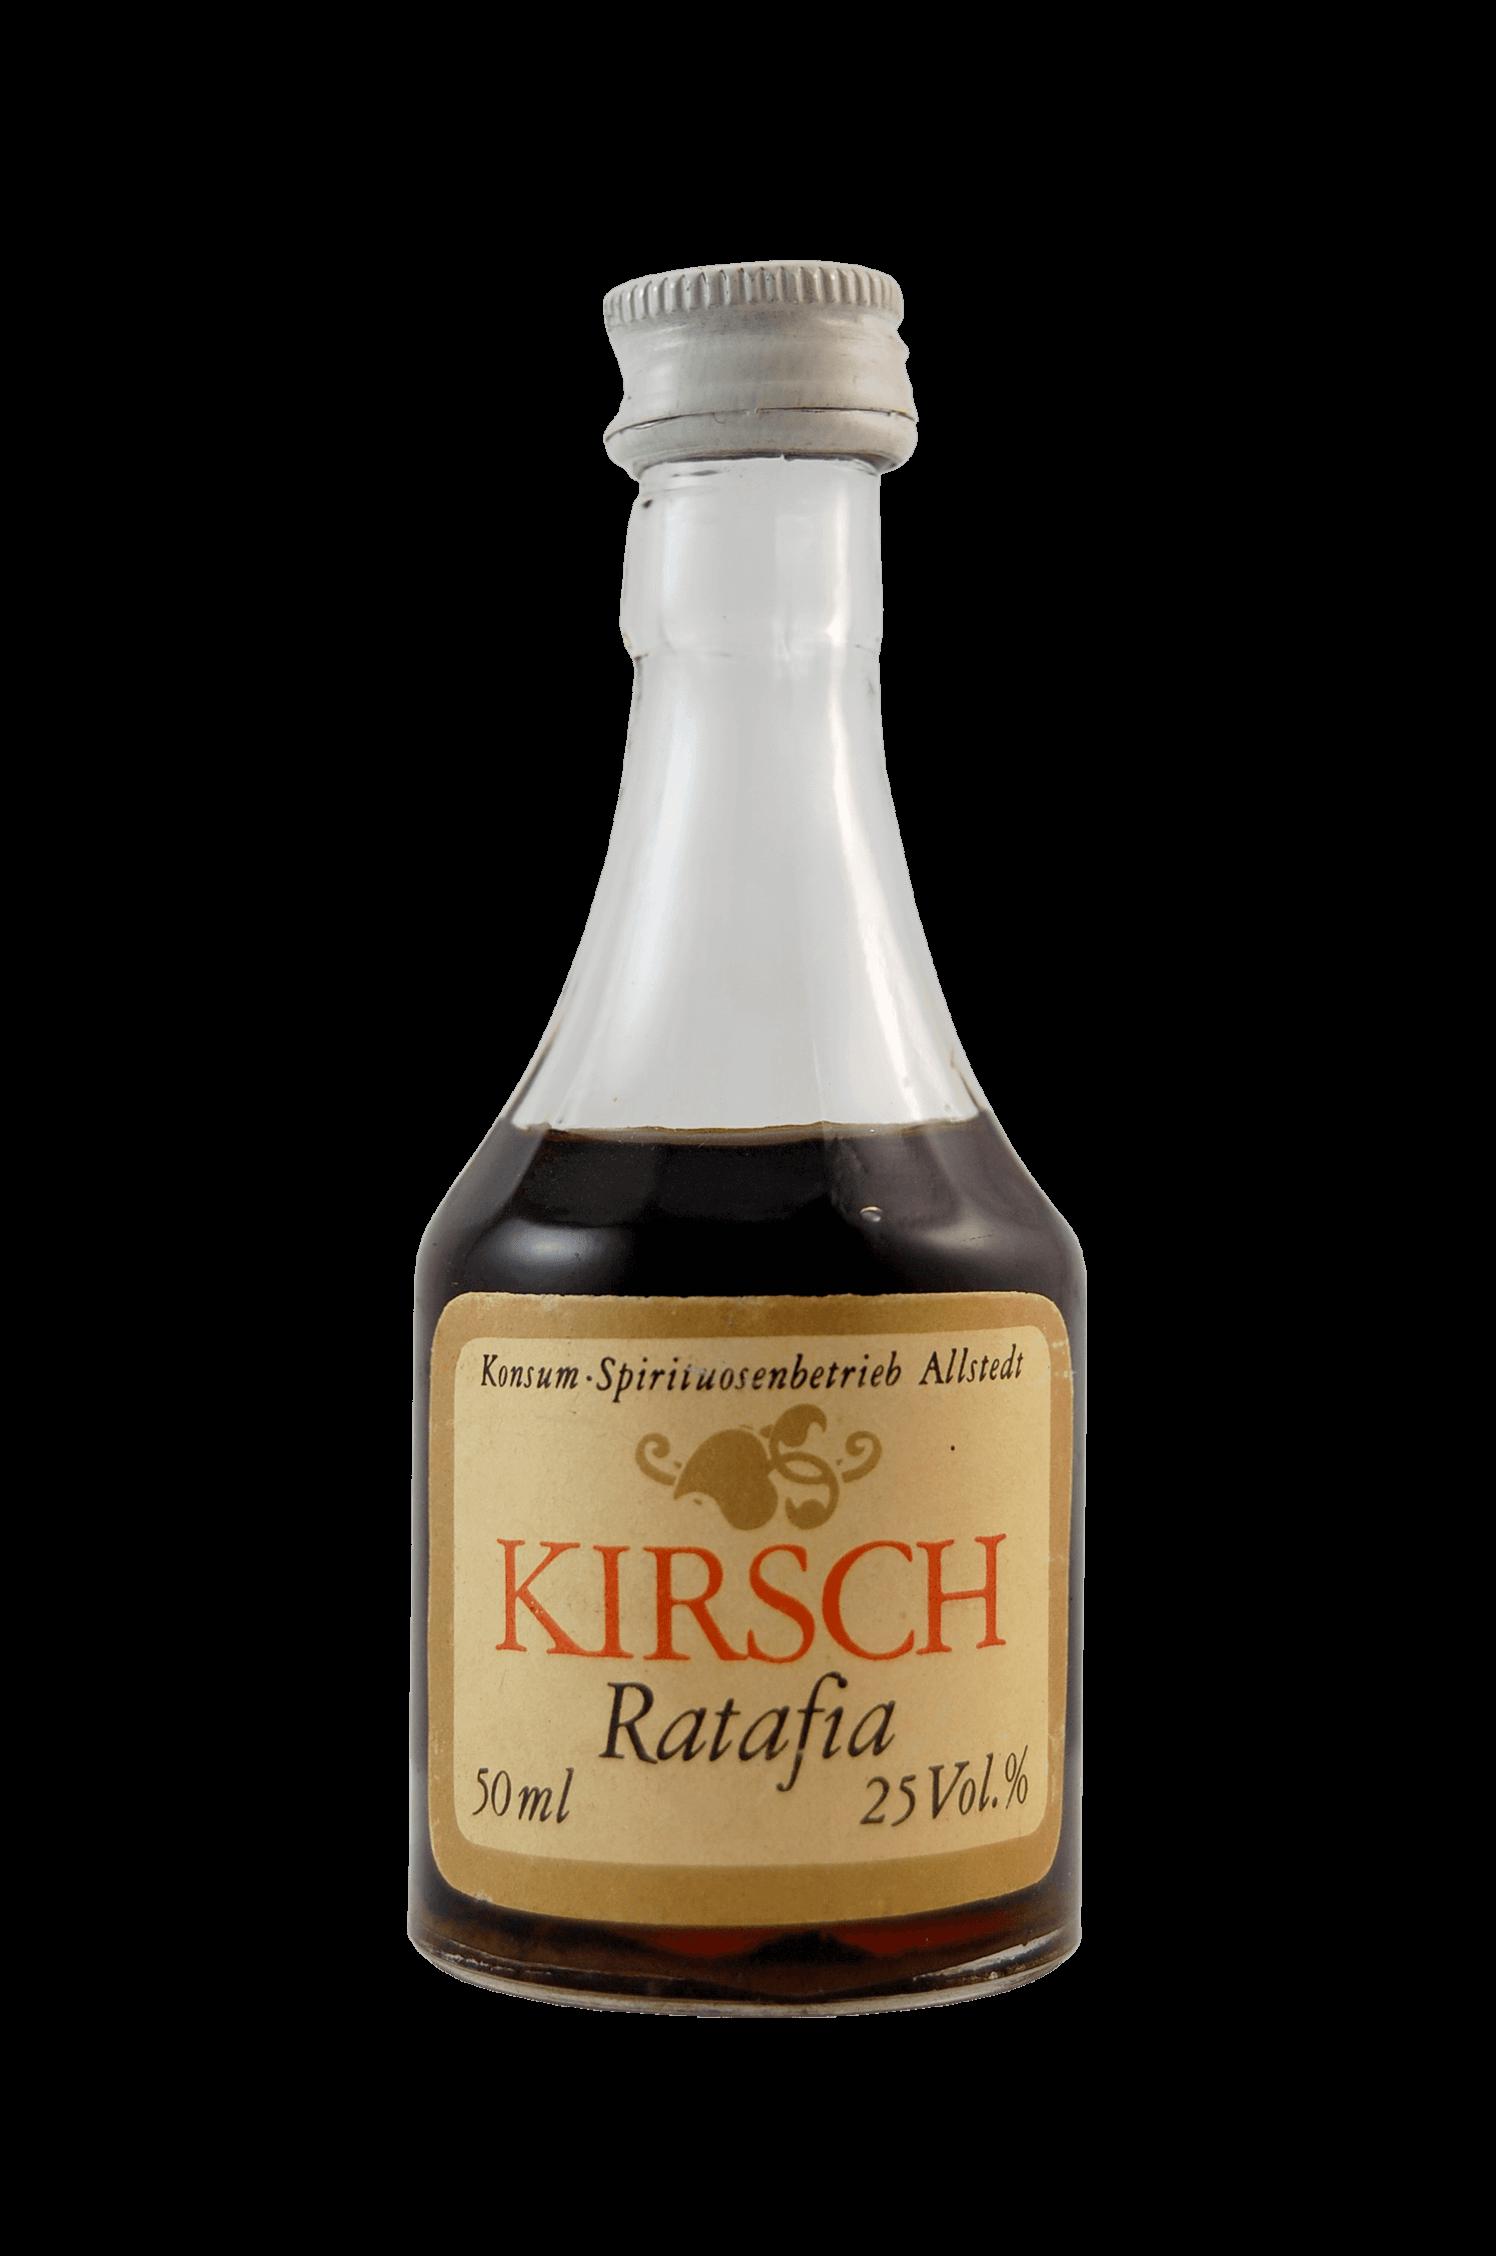 Kirsch Ratafia